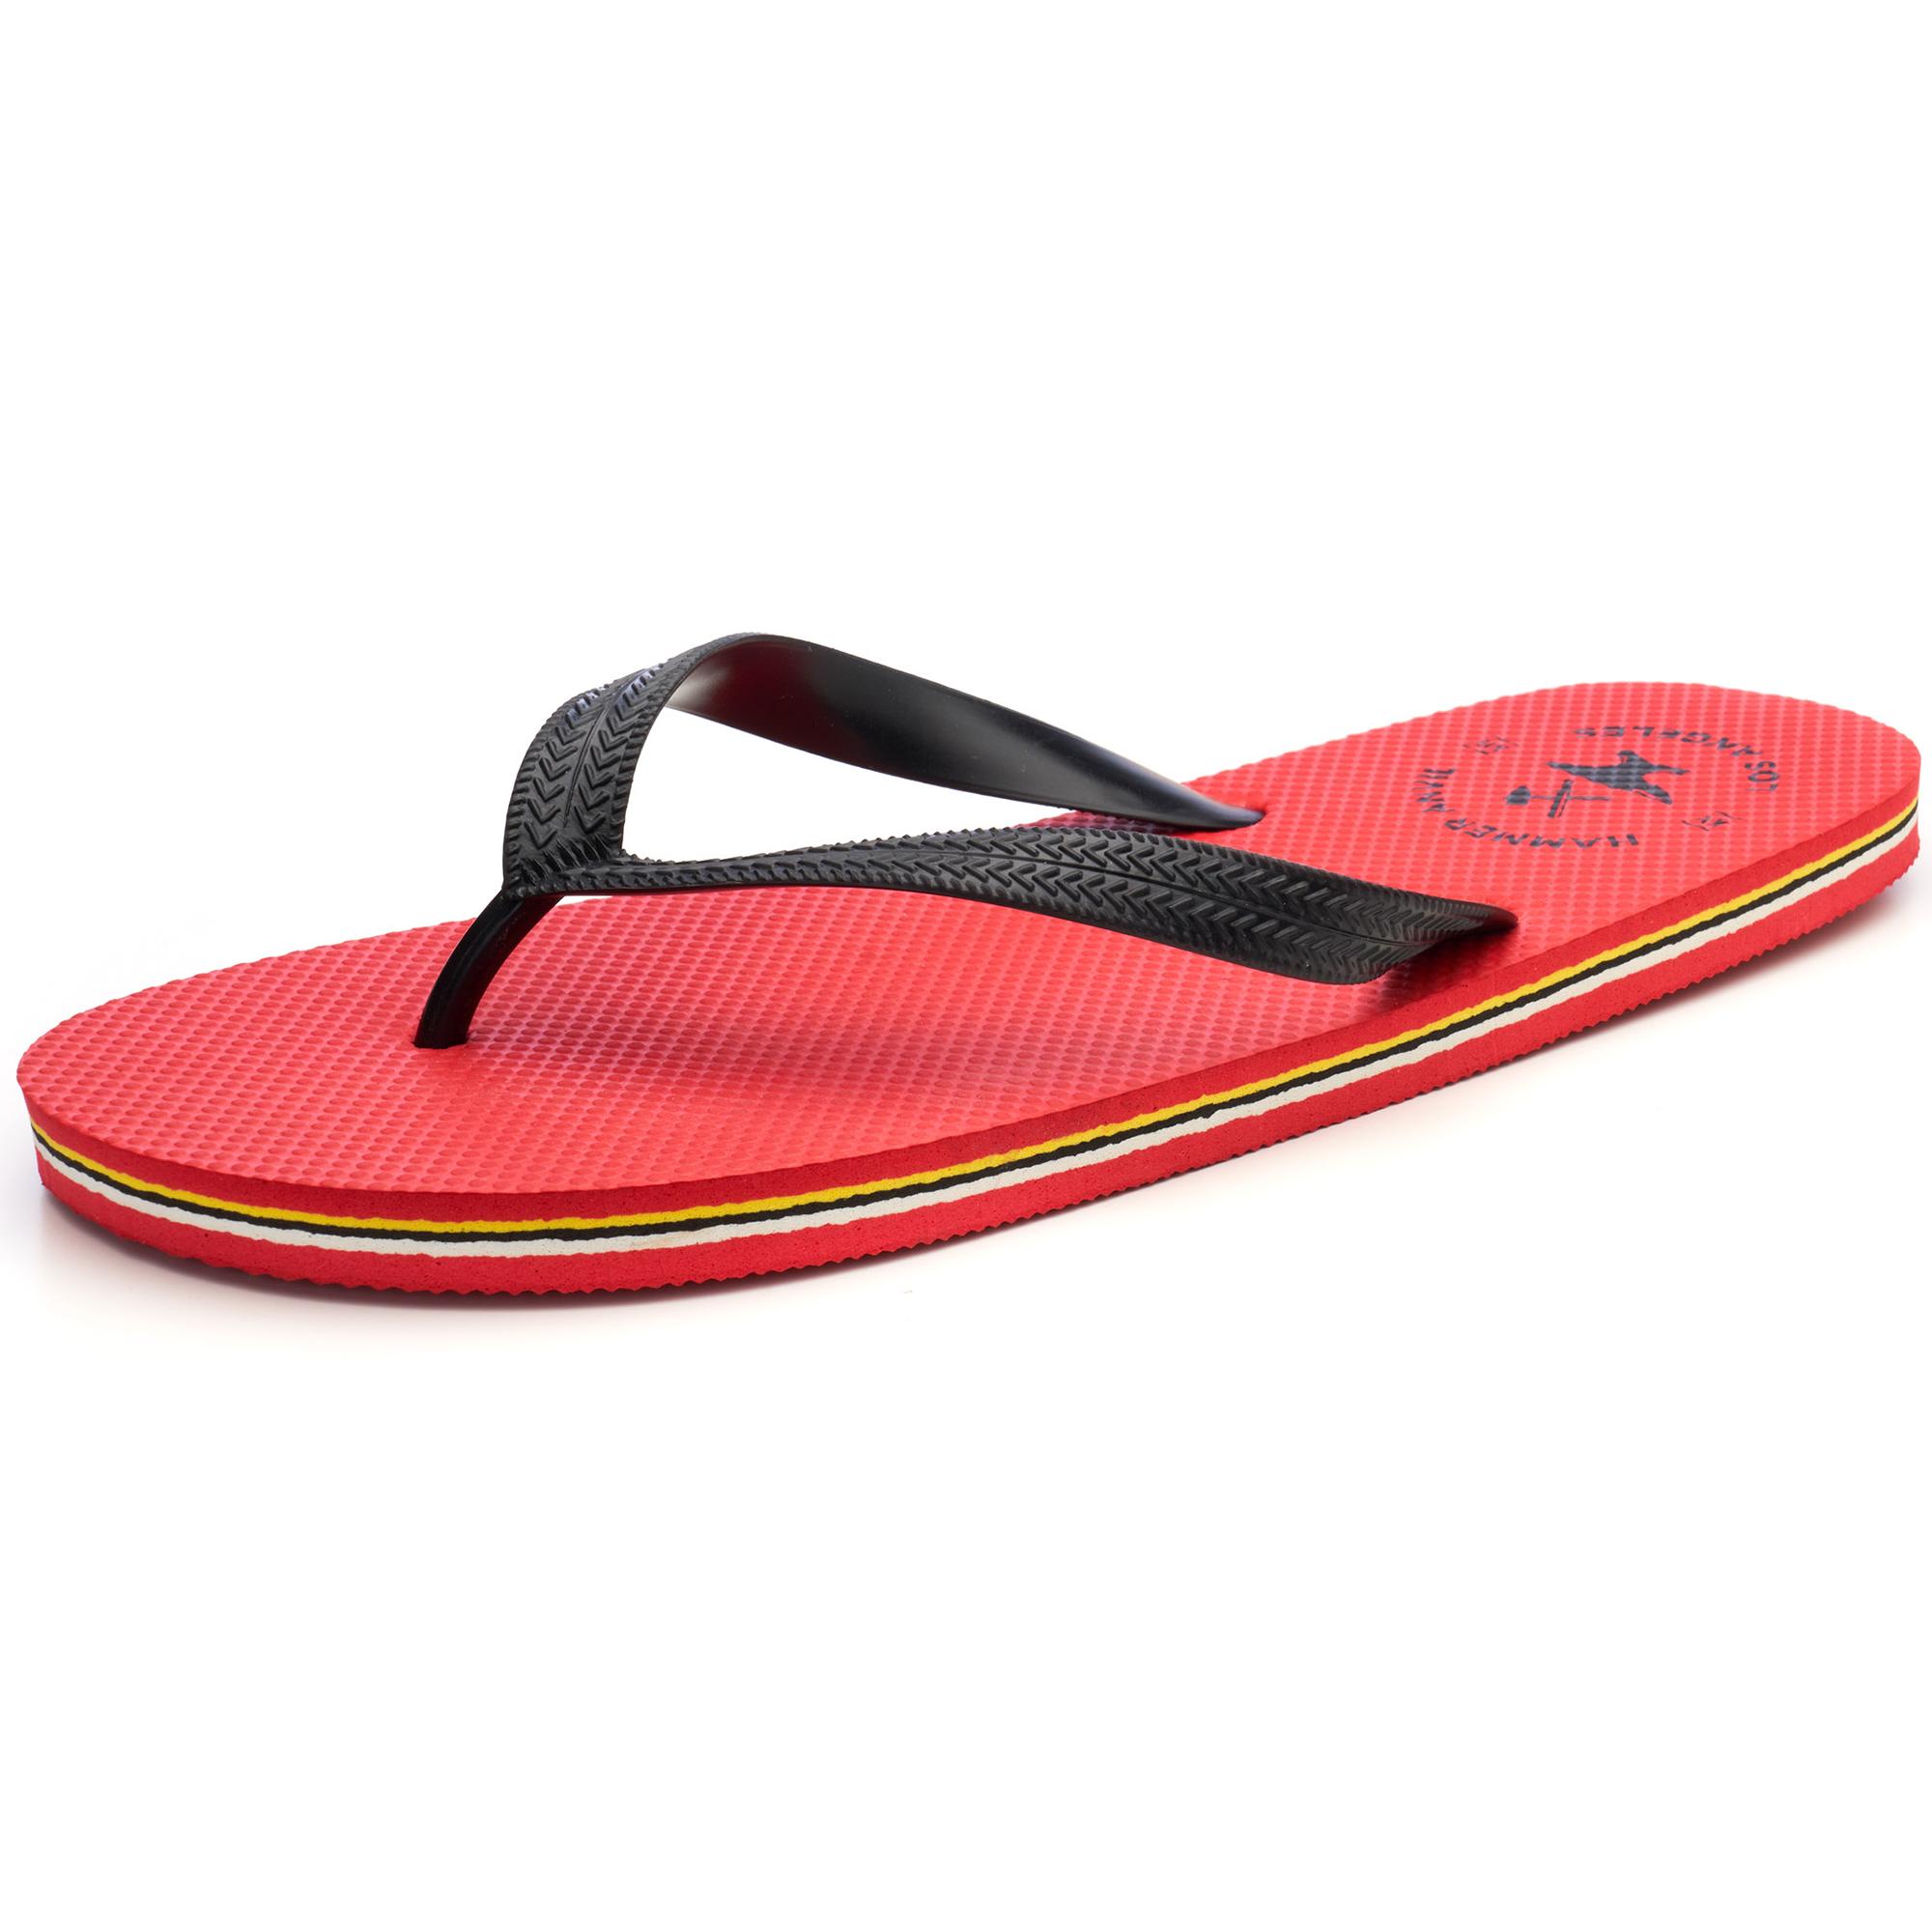 Hammer-Anvil-Mens-Flip-Flops-Casual-Thong-Summer-Sandals-Comfortable-Beach-Shoes thumbnail 40